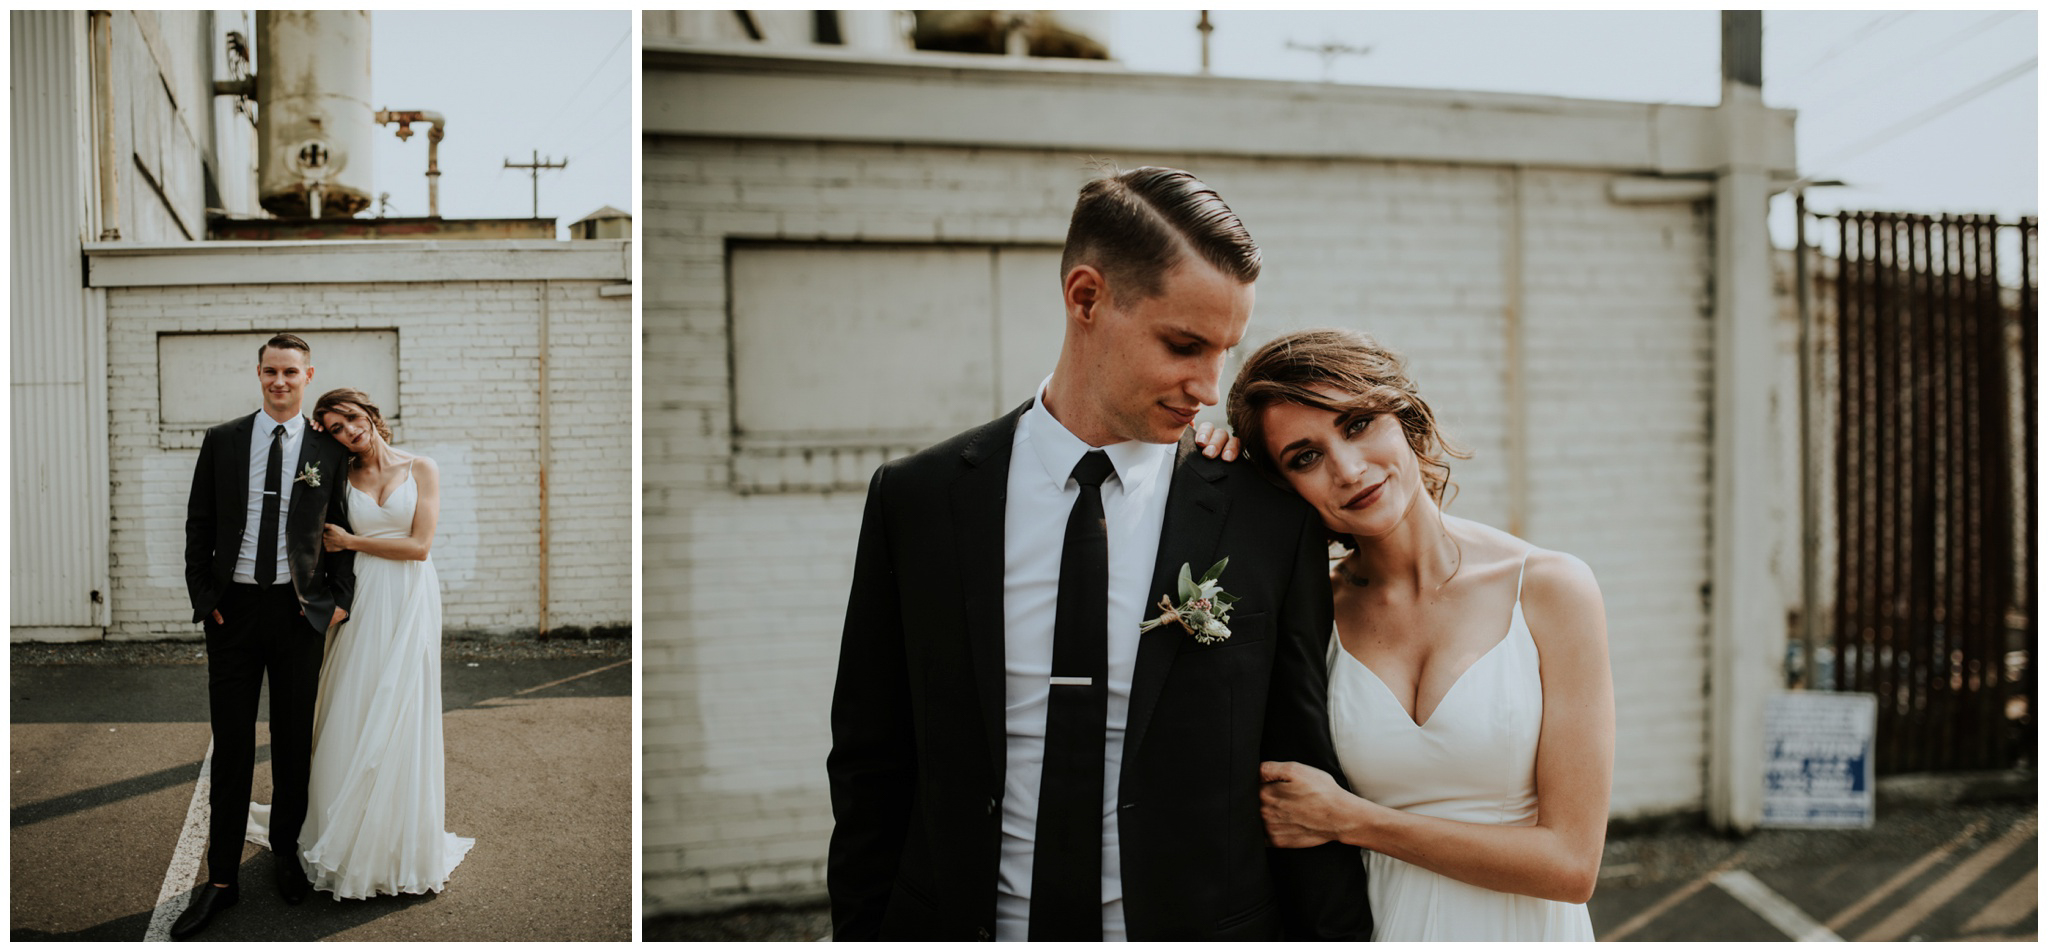 alyssa-keiran-westland-distillery-urban-seattle-wedding-photographer-caitlyn-nikula-75.jpg